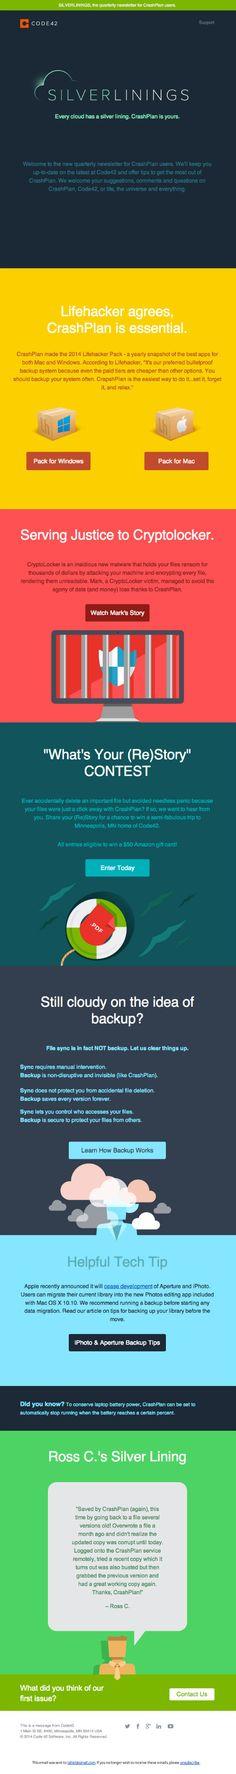 Web SILVERLININGS newsletter #email #design #newsletter #emailmarketing